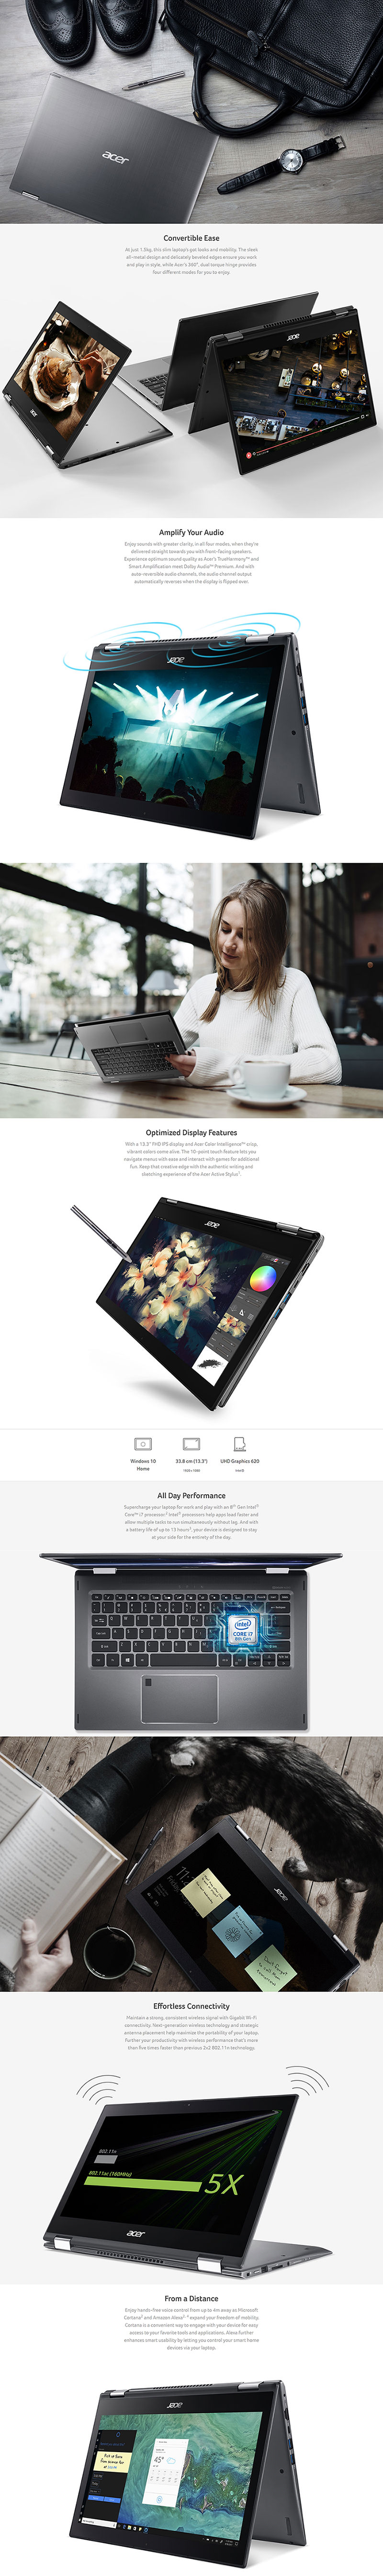 Acer Spin 5 13.3in FHD Touch i5 8250U 256GB SSD 8GB RAM W10H 2-1 Laptop (SP513-52N-58E1)